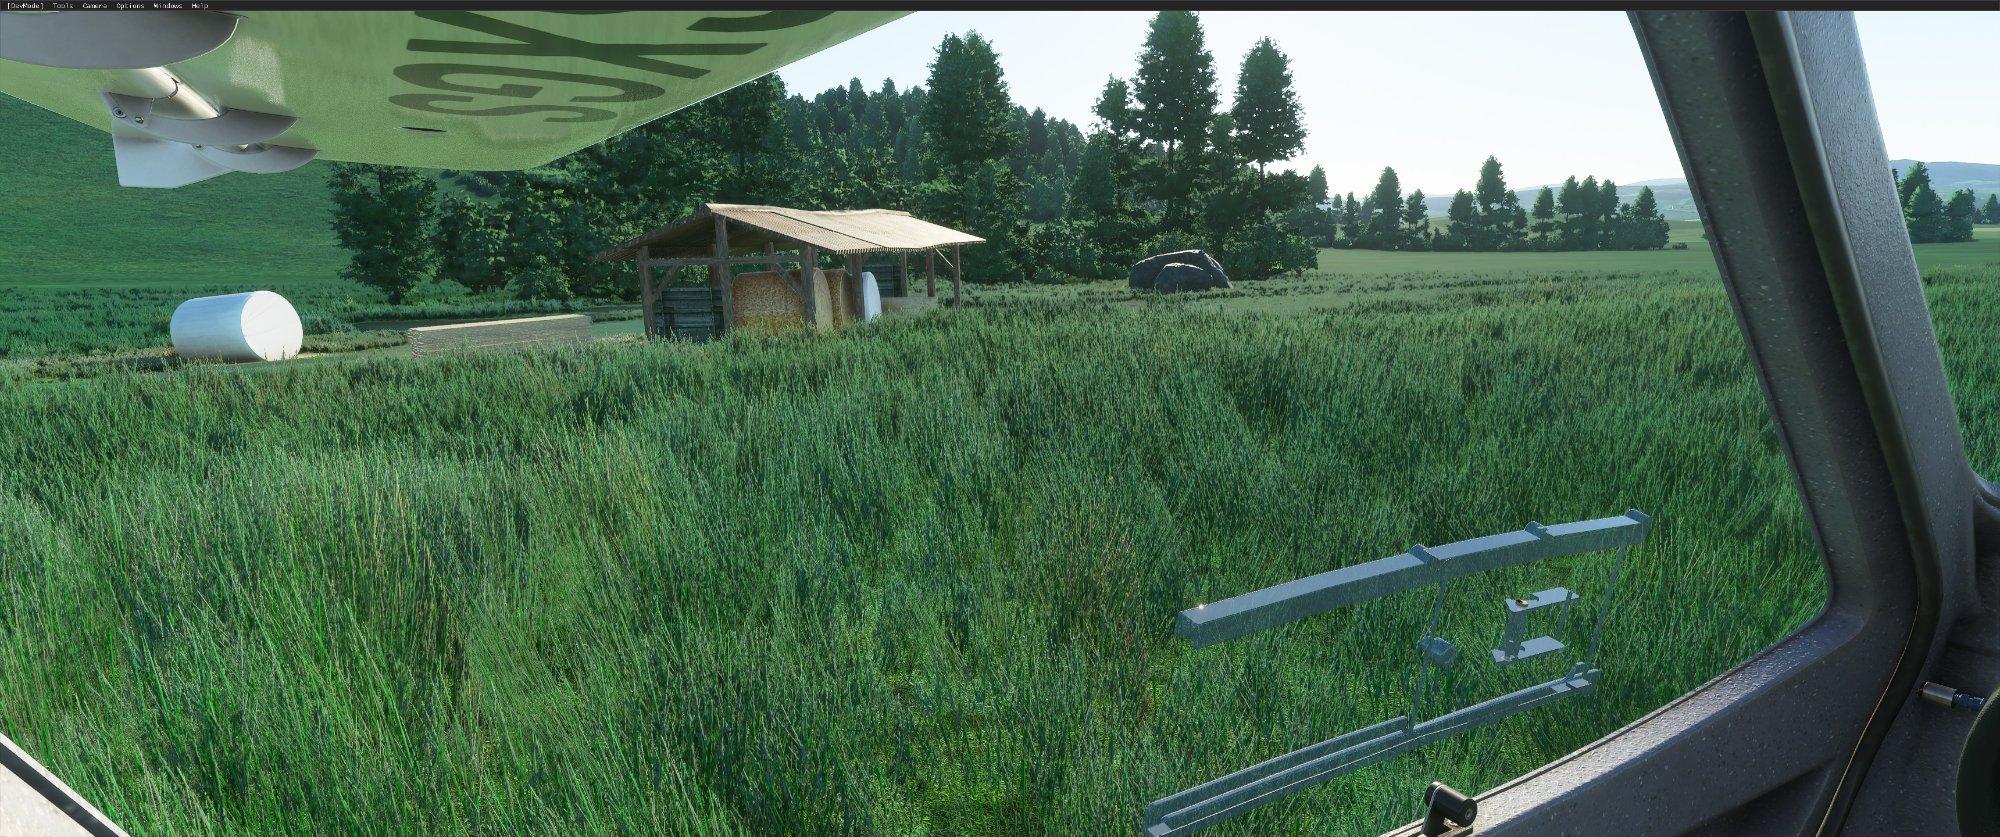 Microsoft Flight Simulator Screenshot 2020.10.07 - 19.40.19.48.jpg